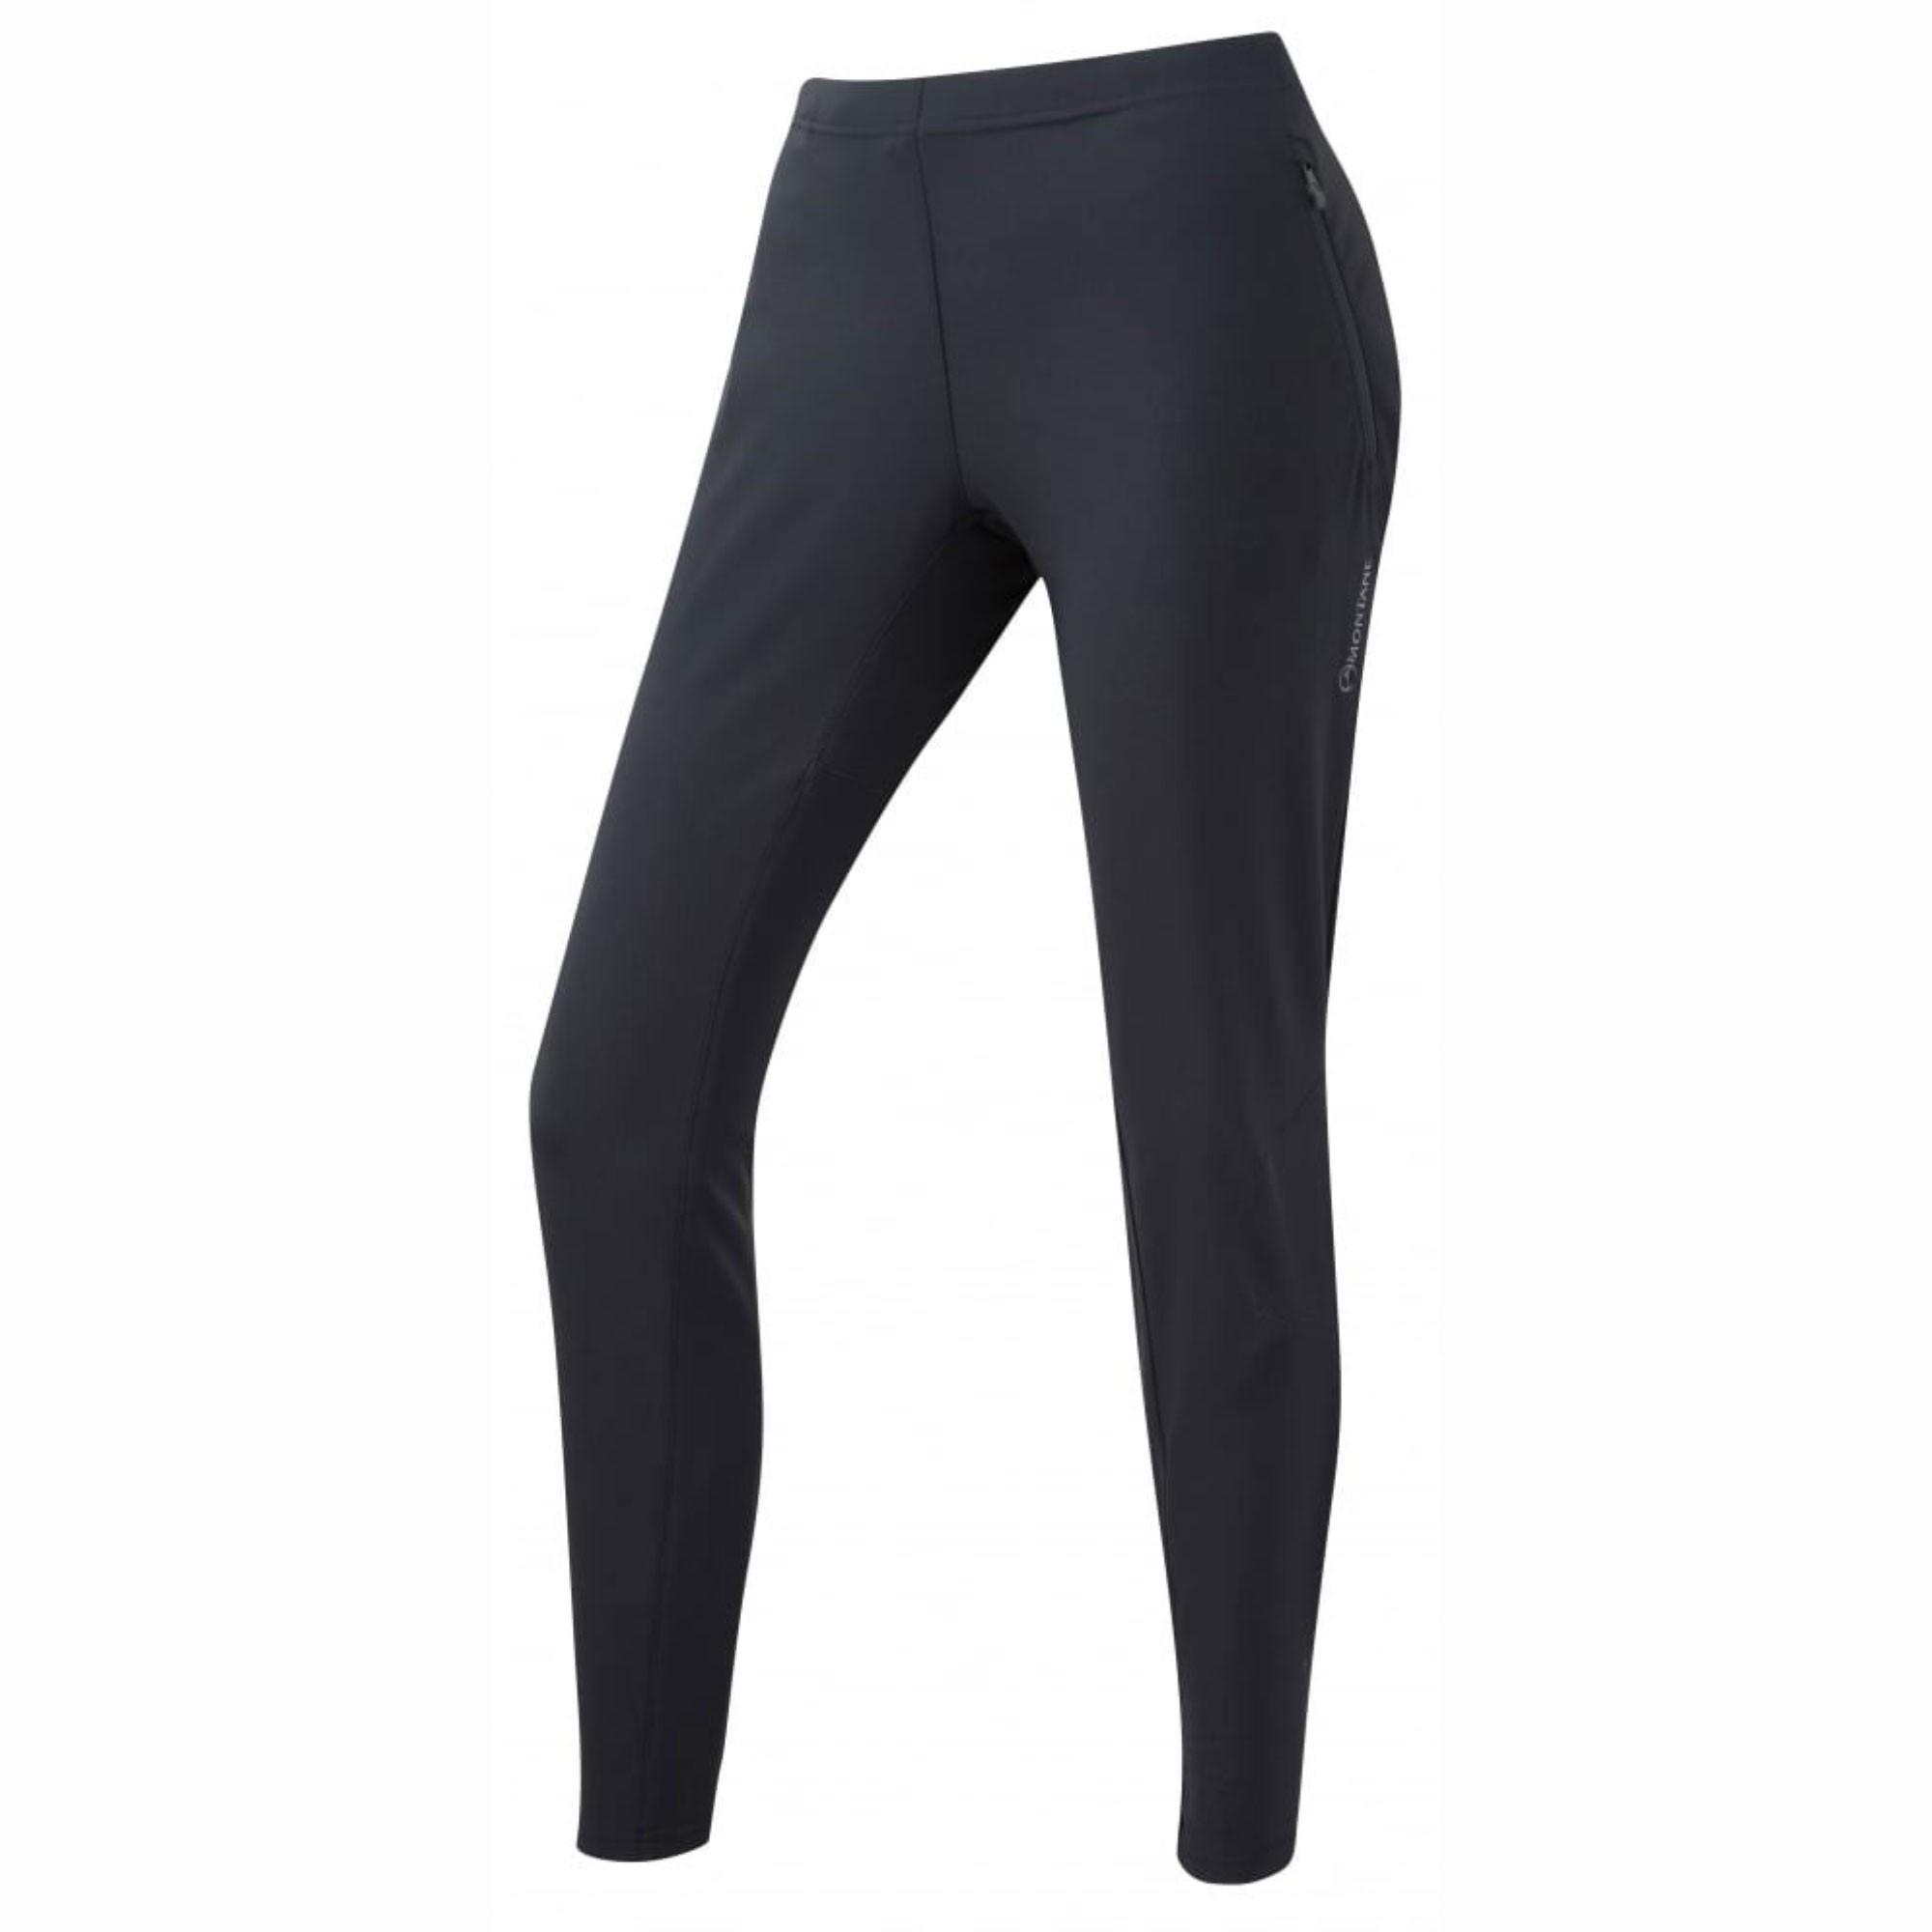 Montane Women's Ineo Pro Pants - Black